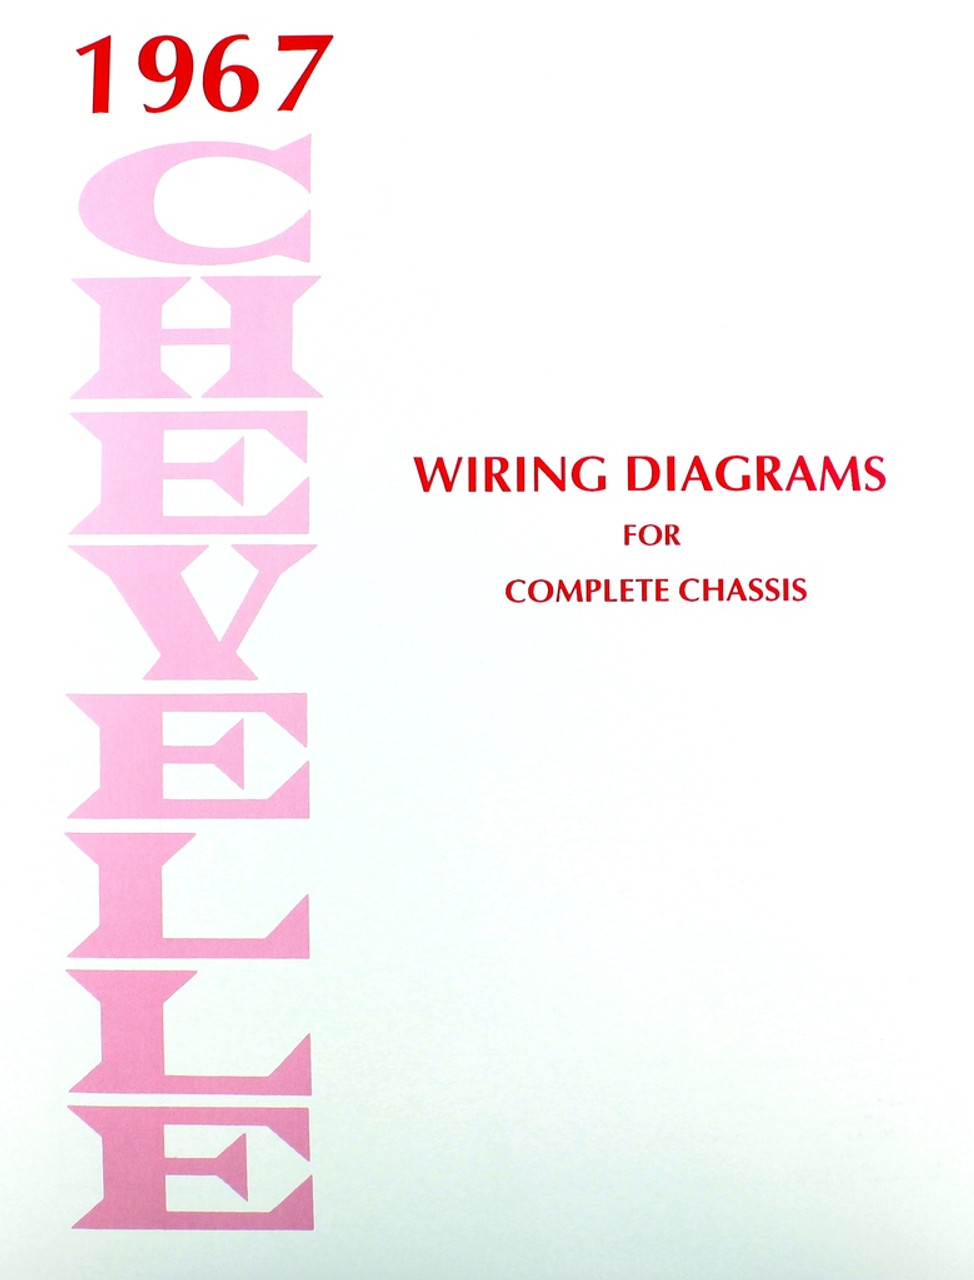 67 1967 Chevelle El Camino Electrical Wiring Diagram